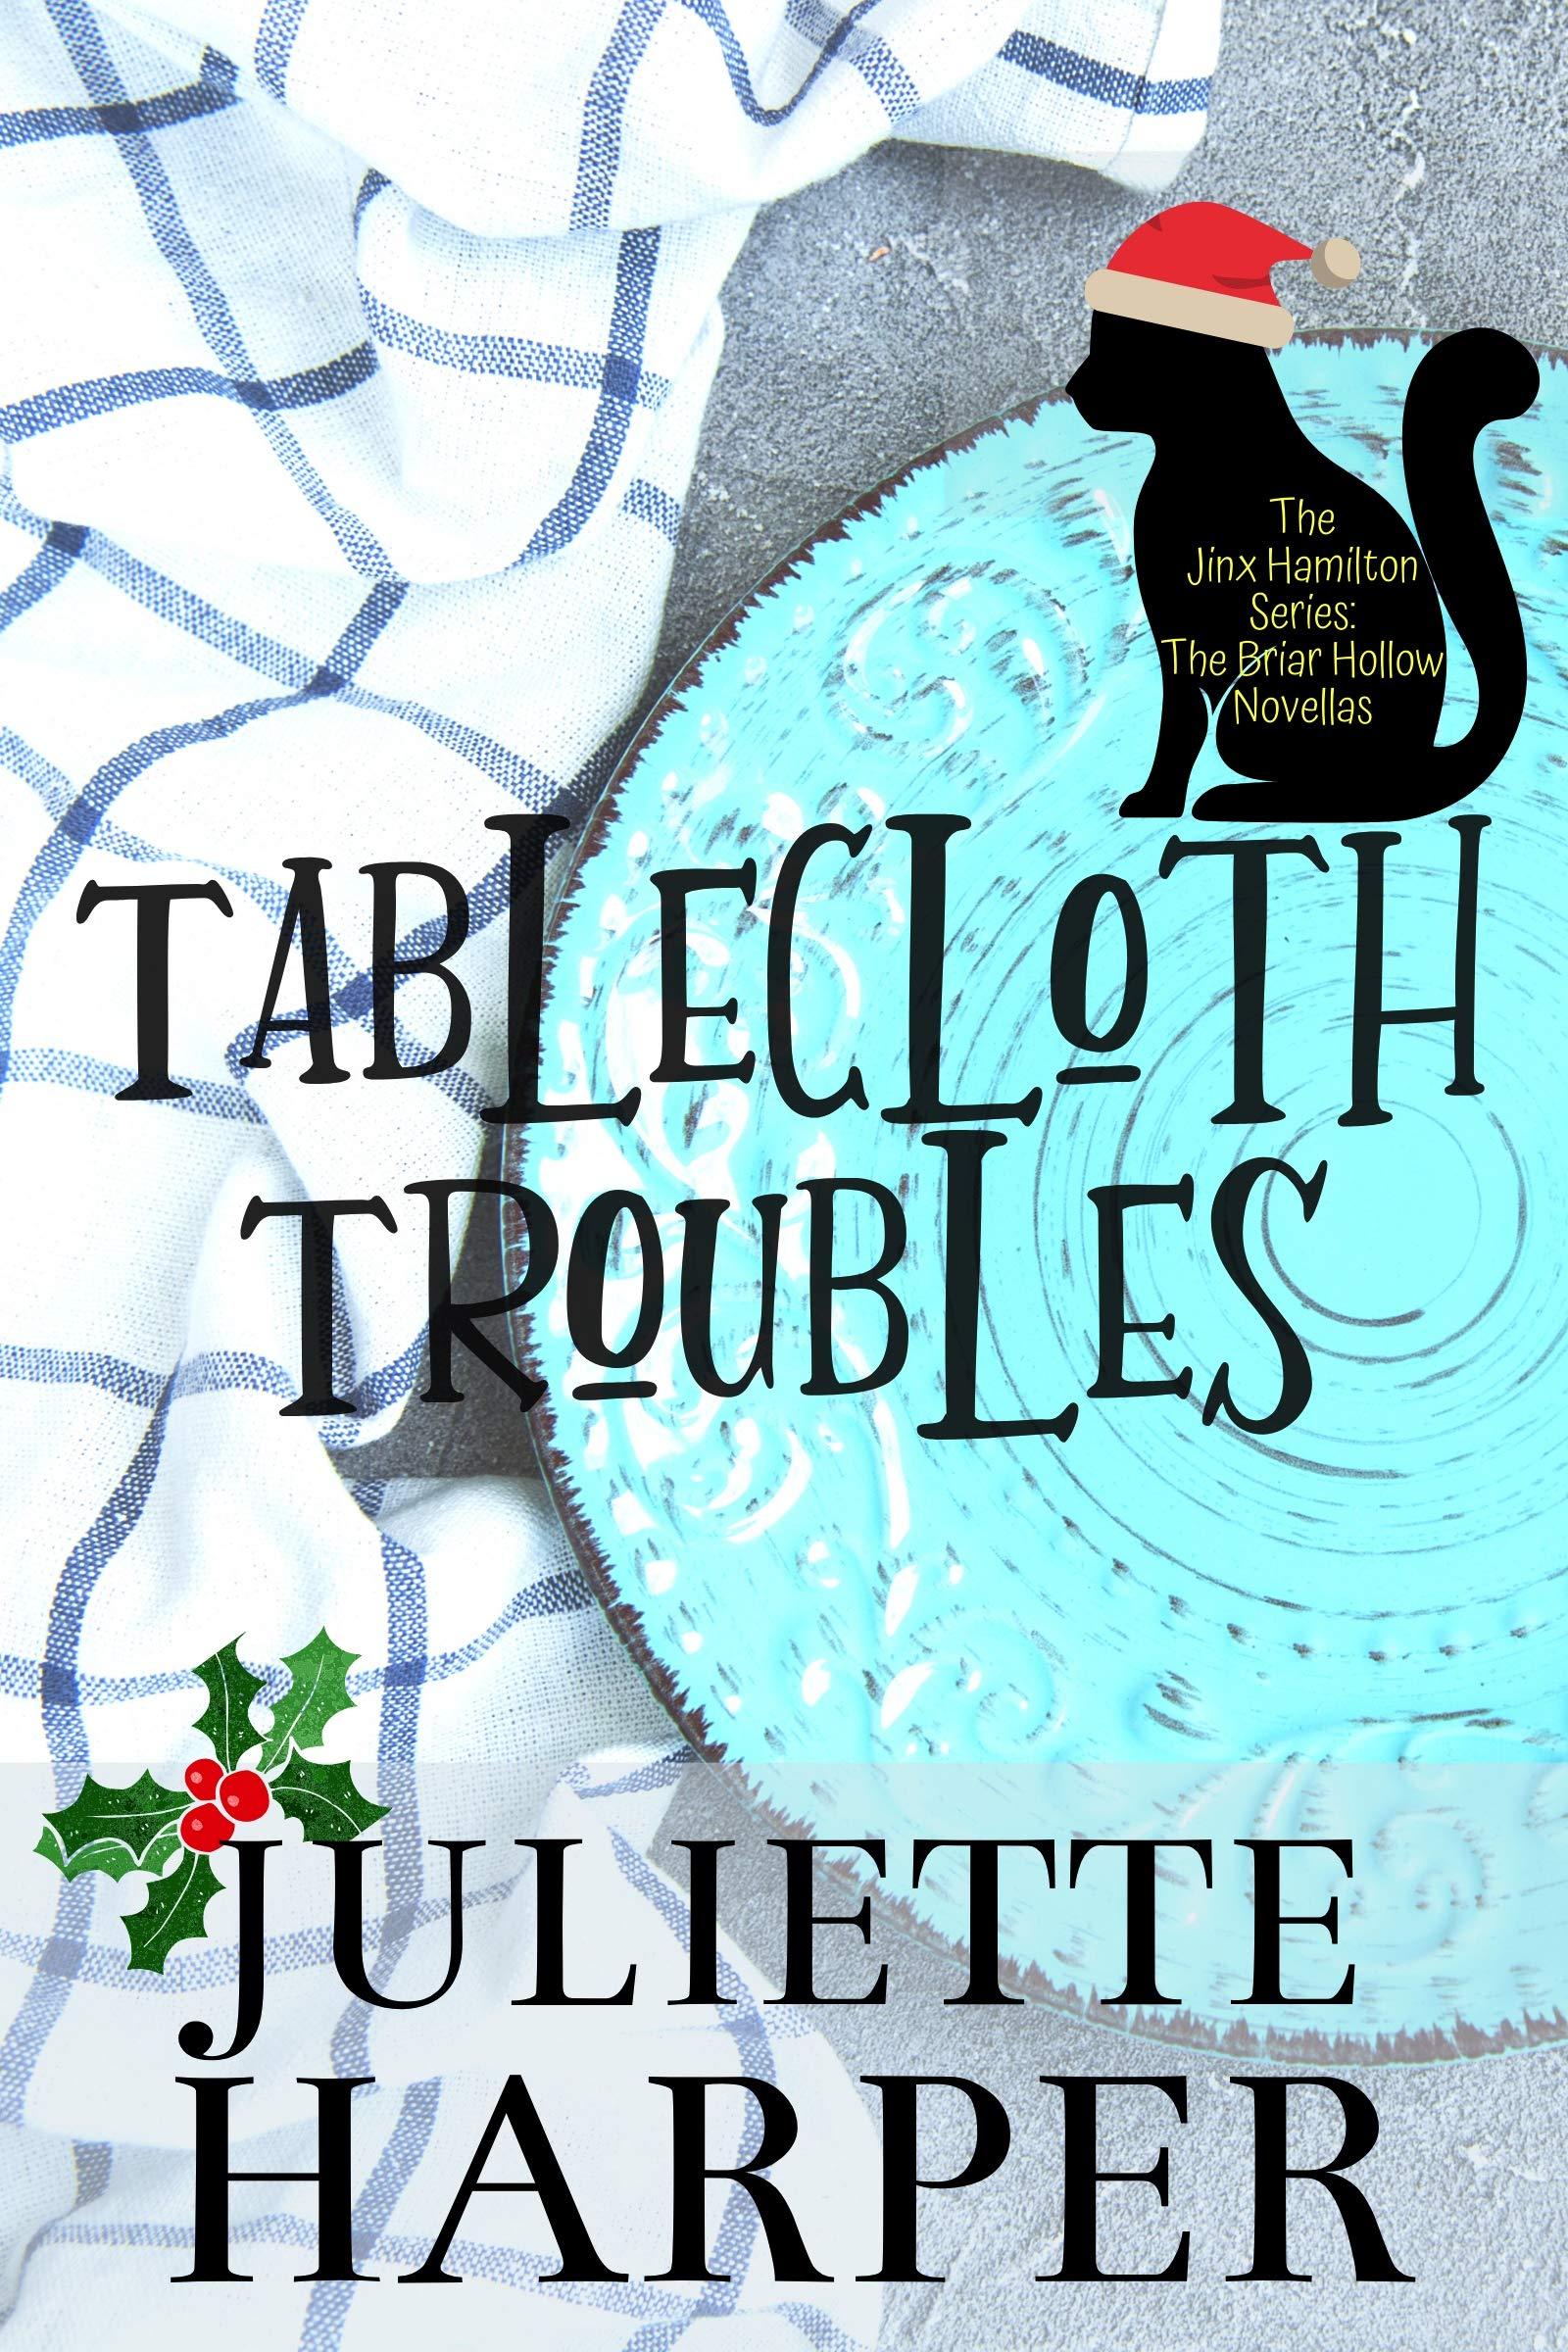 Tablecloth Troubles (The Jinx Hamilton Series) (The Briar Hollow Novellas #2)